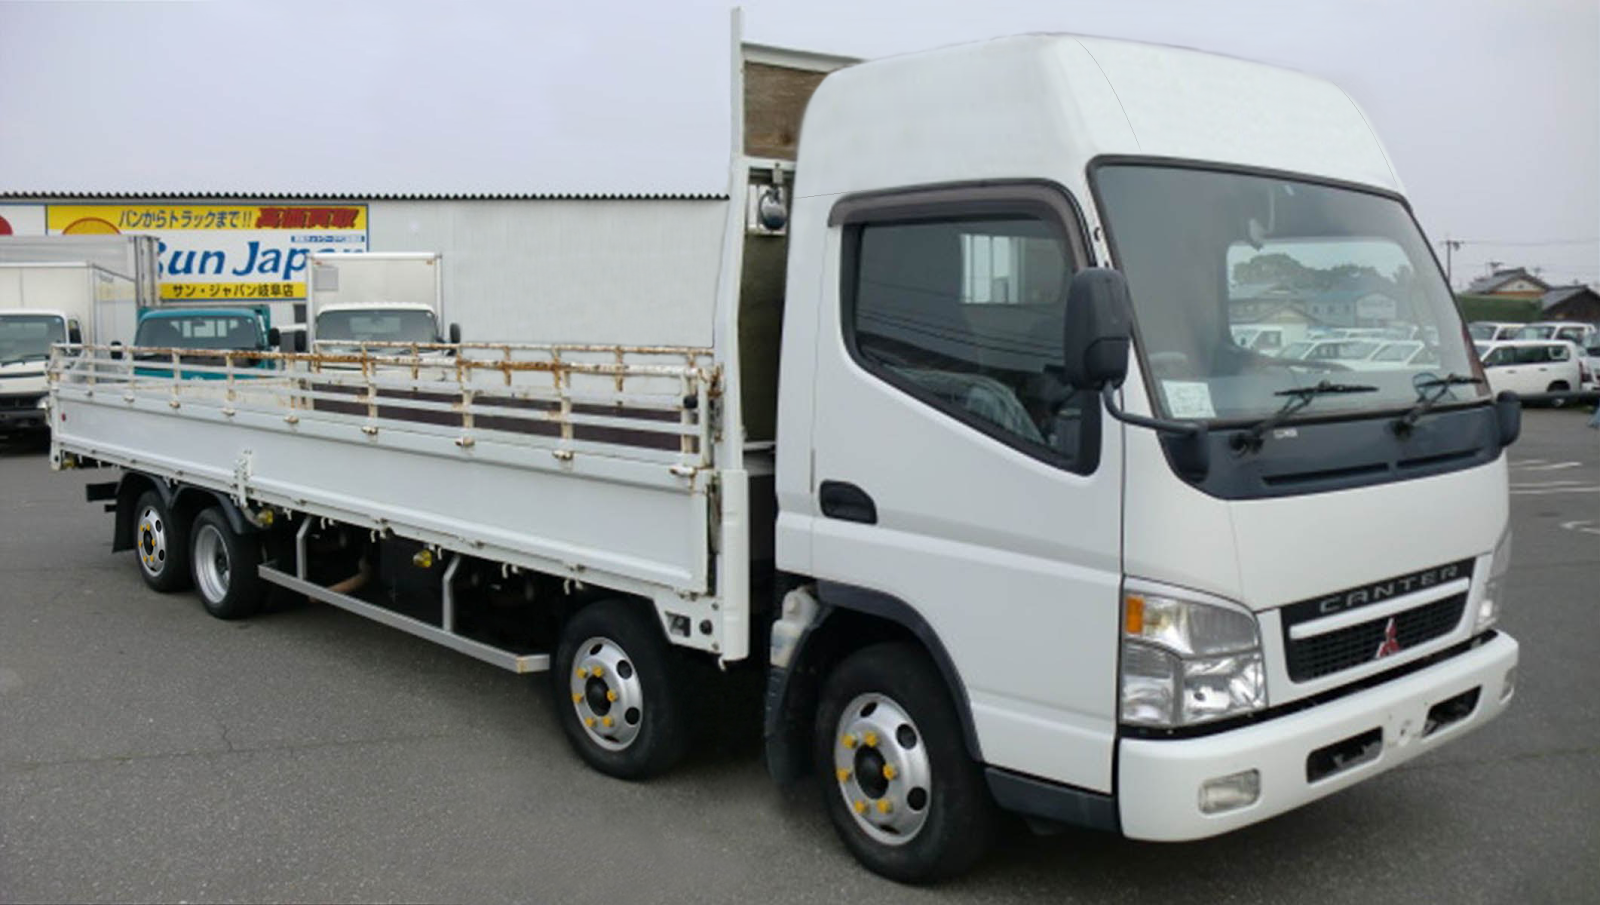 Kumpulan Modifikasi Mobil Truk Mitsubishi Terlengkap Modifikasi